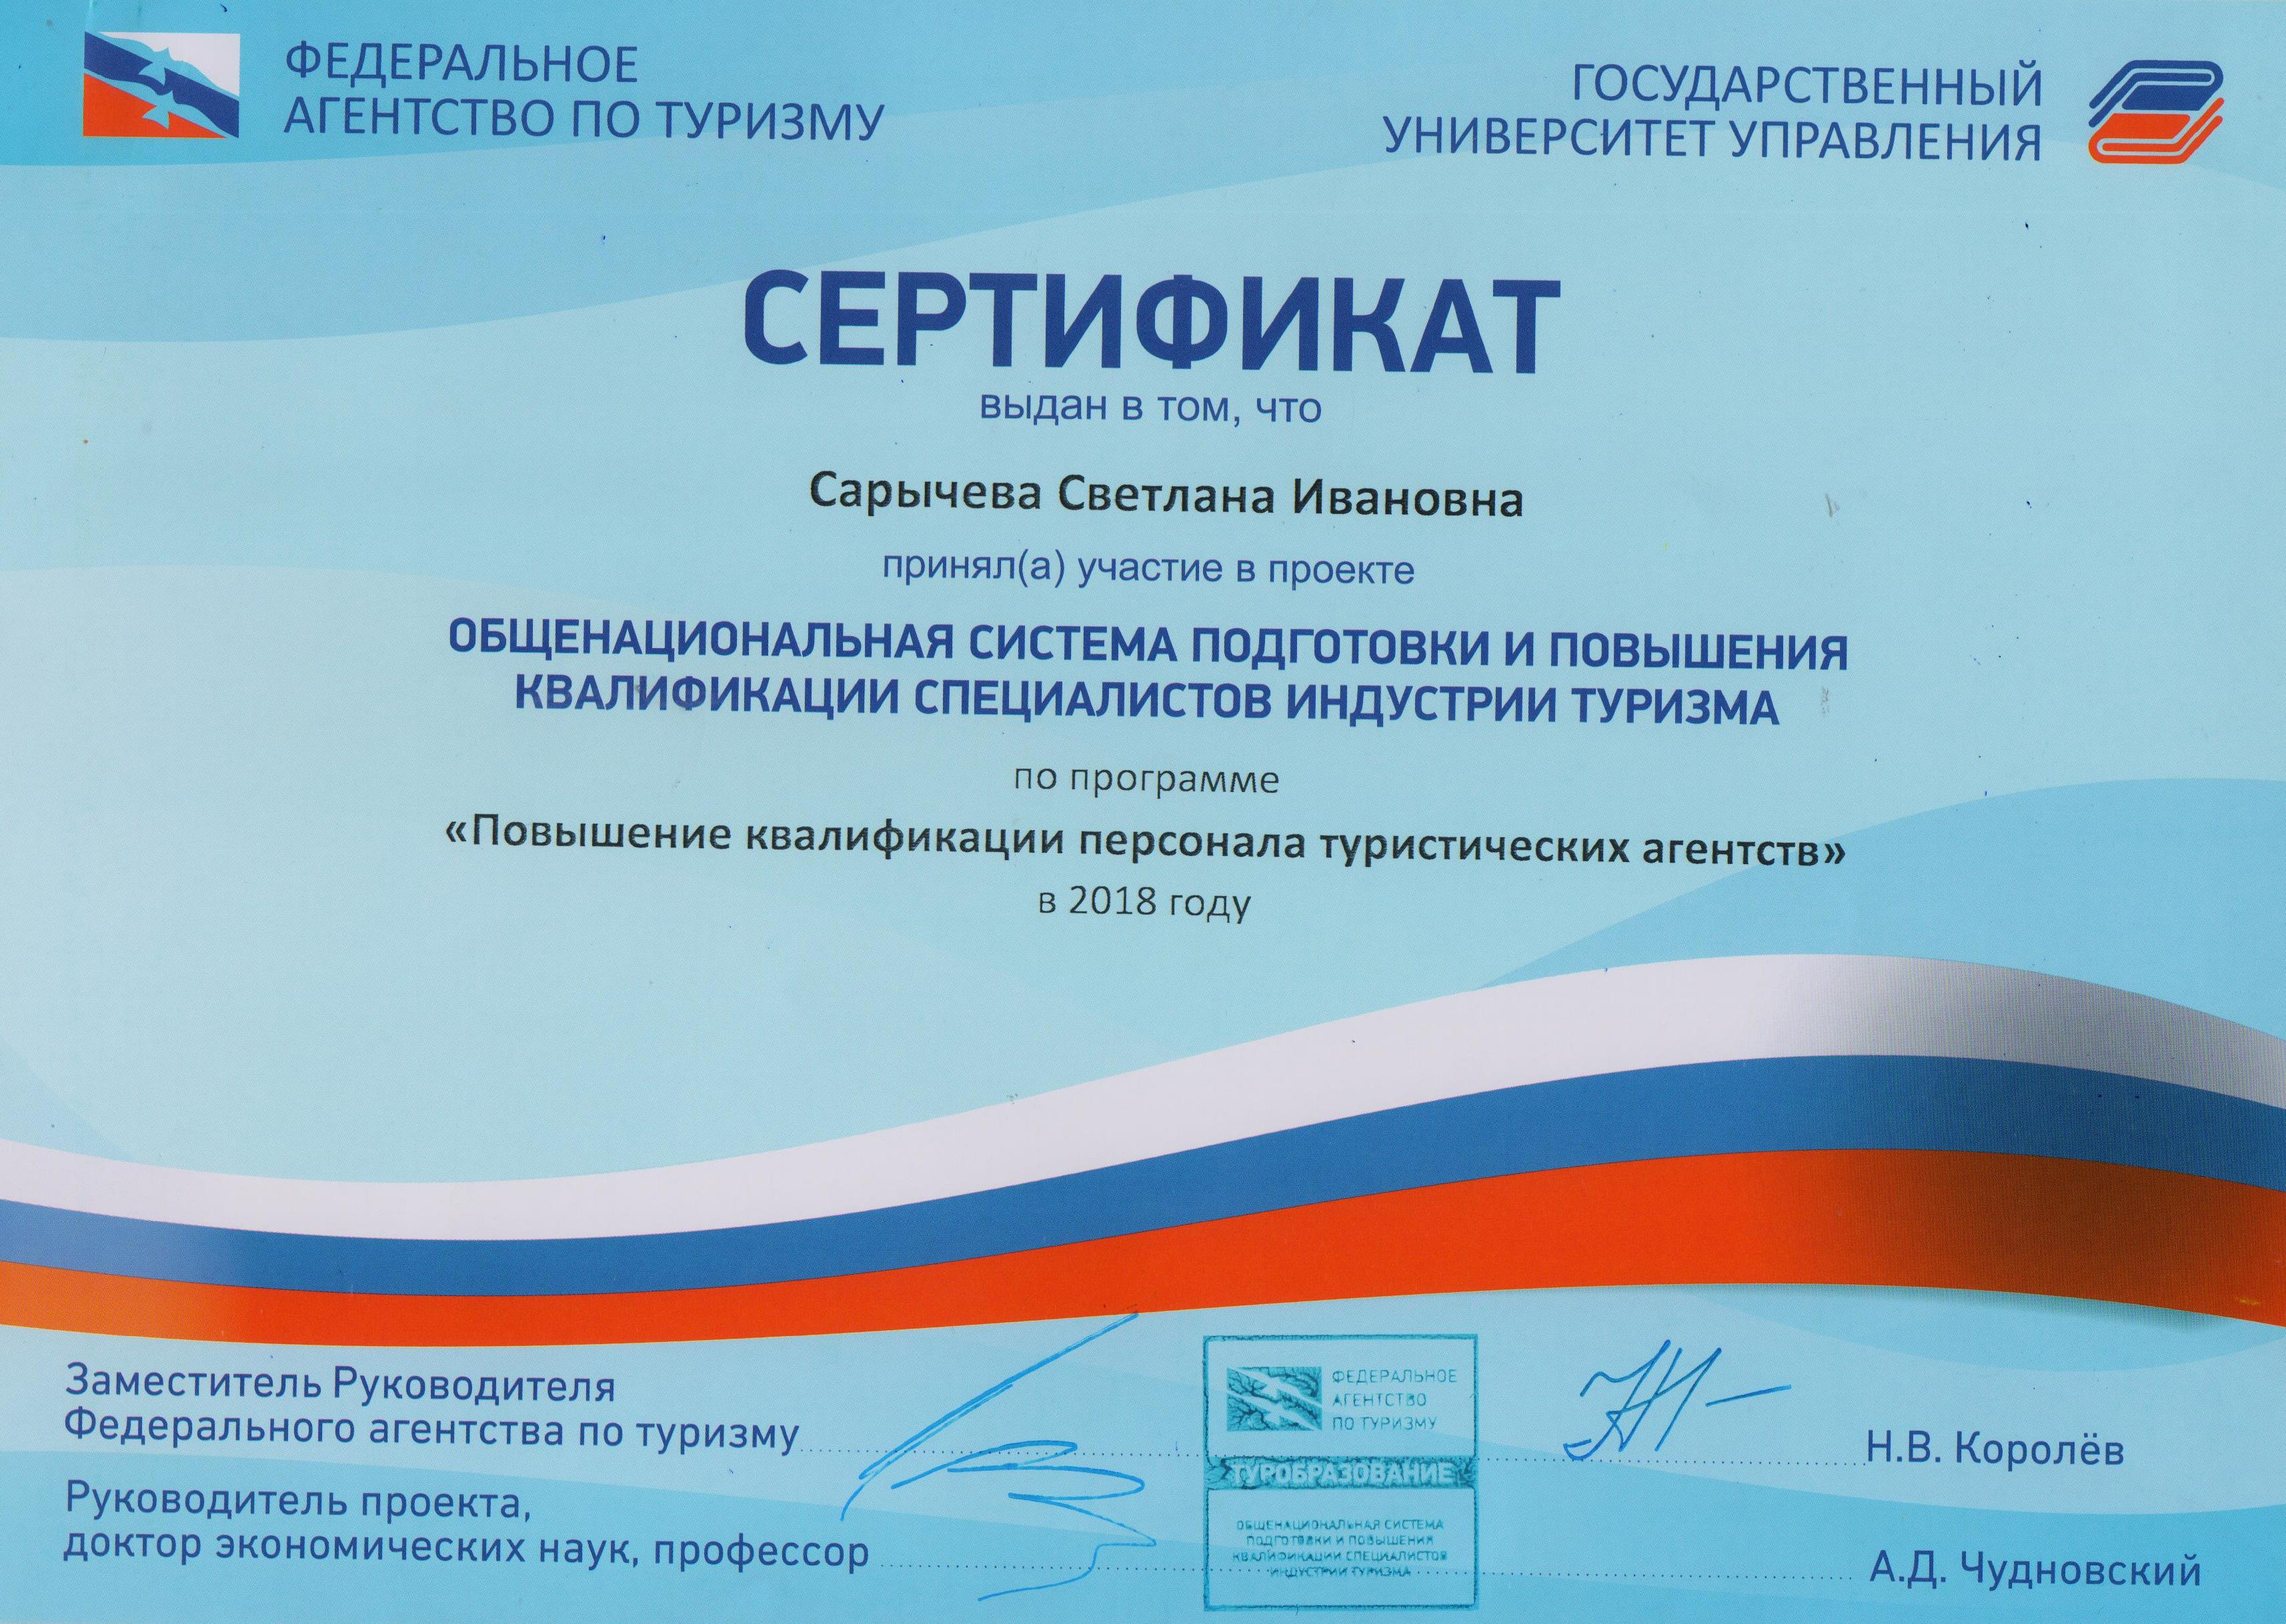 СЕРТИФИКАТ САРЫЧЕВА С.И 001.jpg